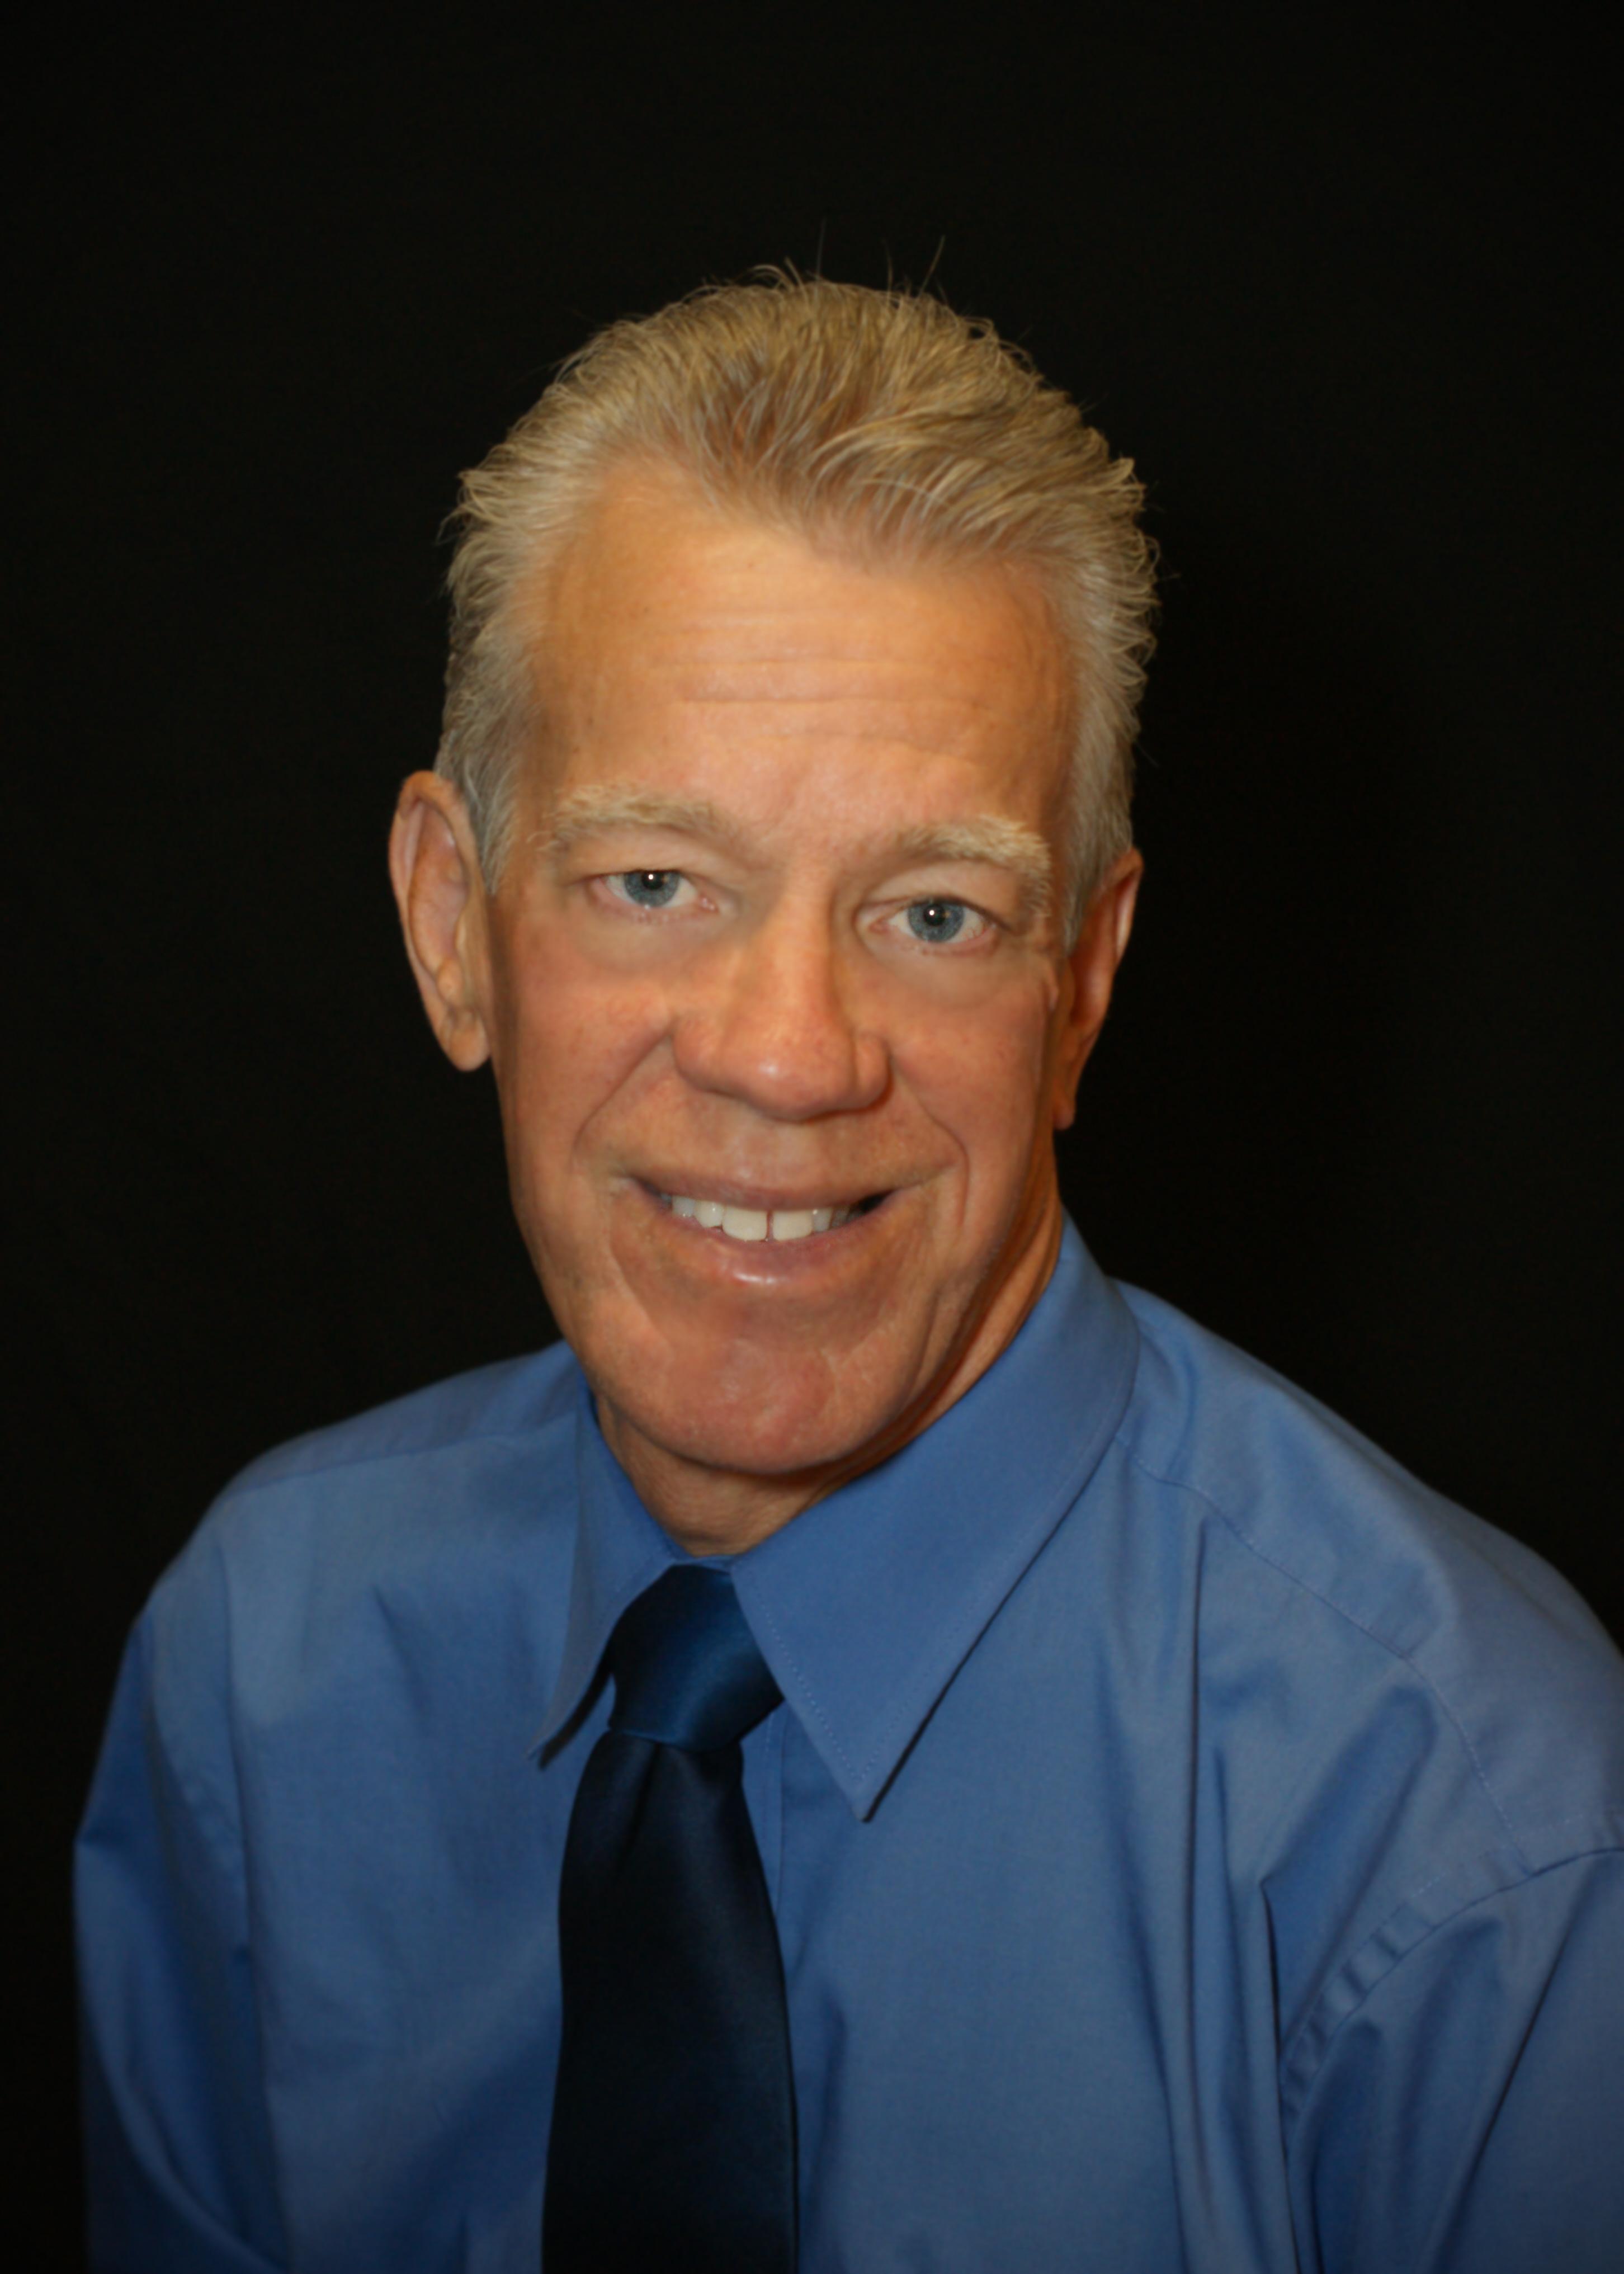 Robert Tompkins at Your Arizona Home Team